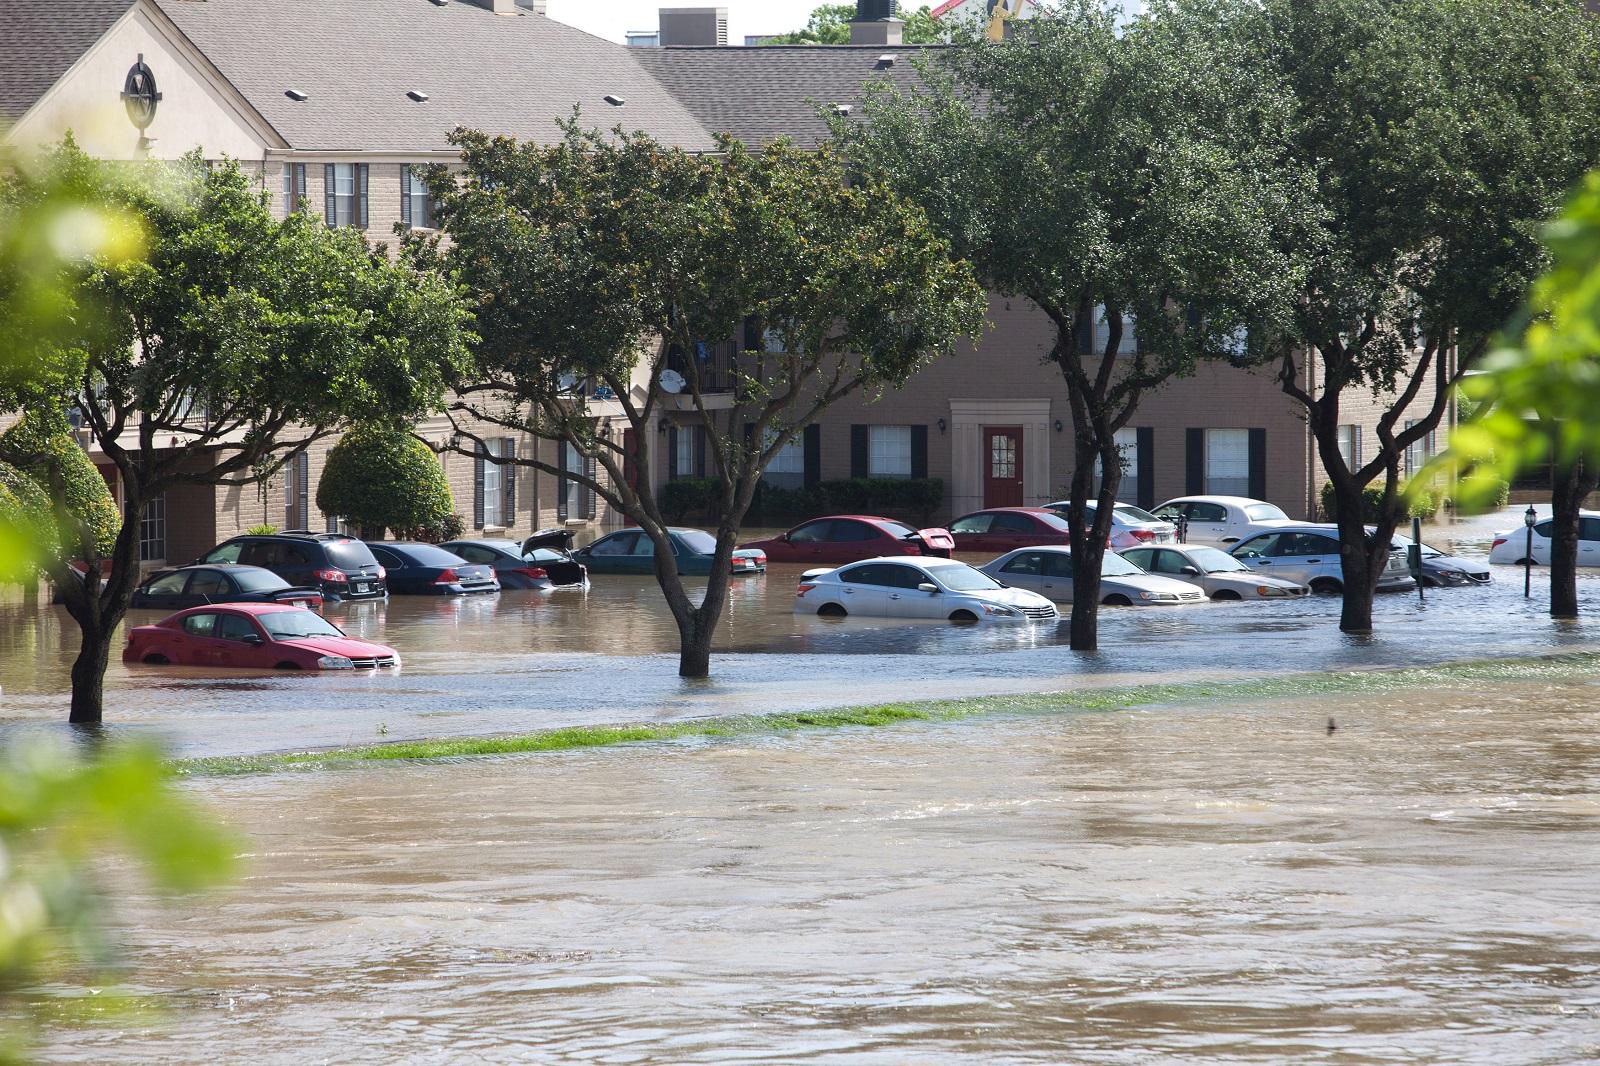 Storms in Houston, Texas